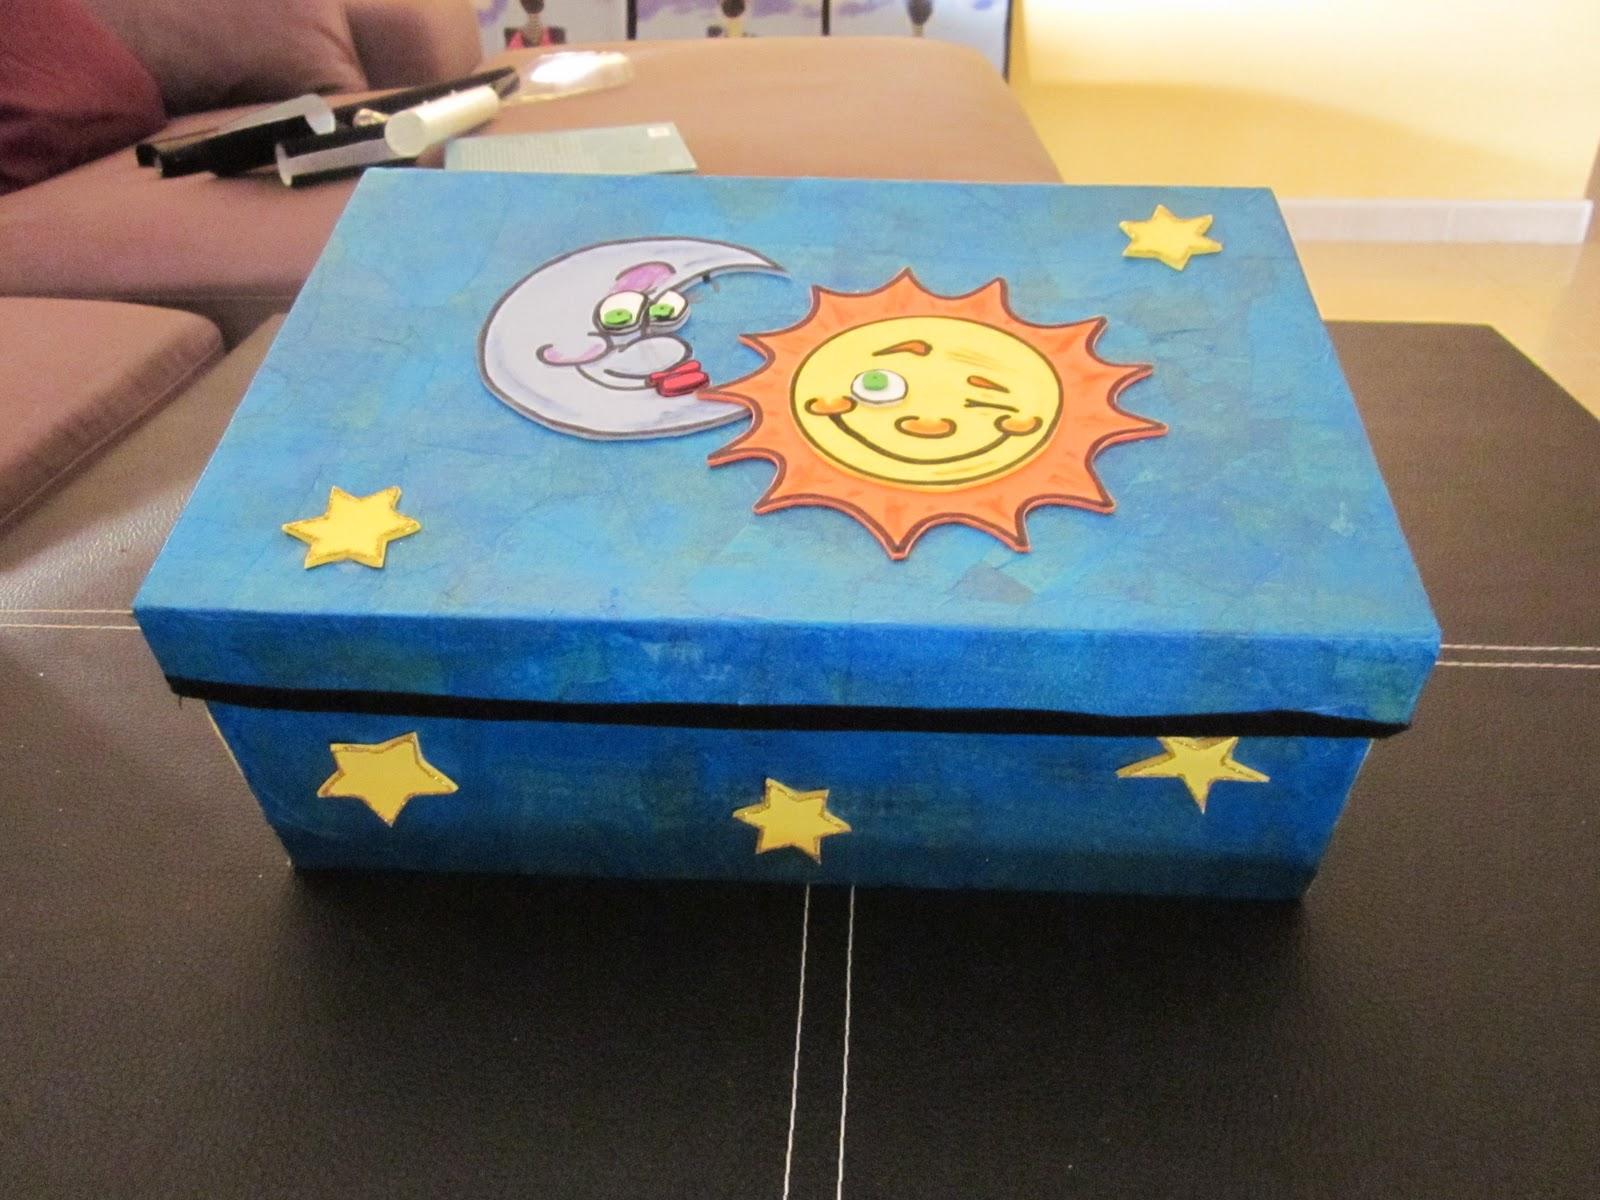 Cajas de carton decoradas con foami imagui - Cajas grandes de carton decoradas ...